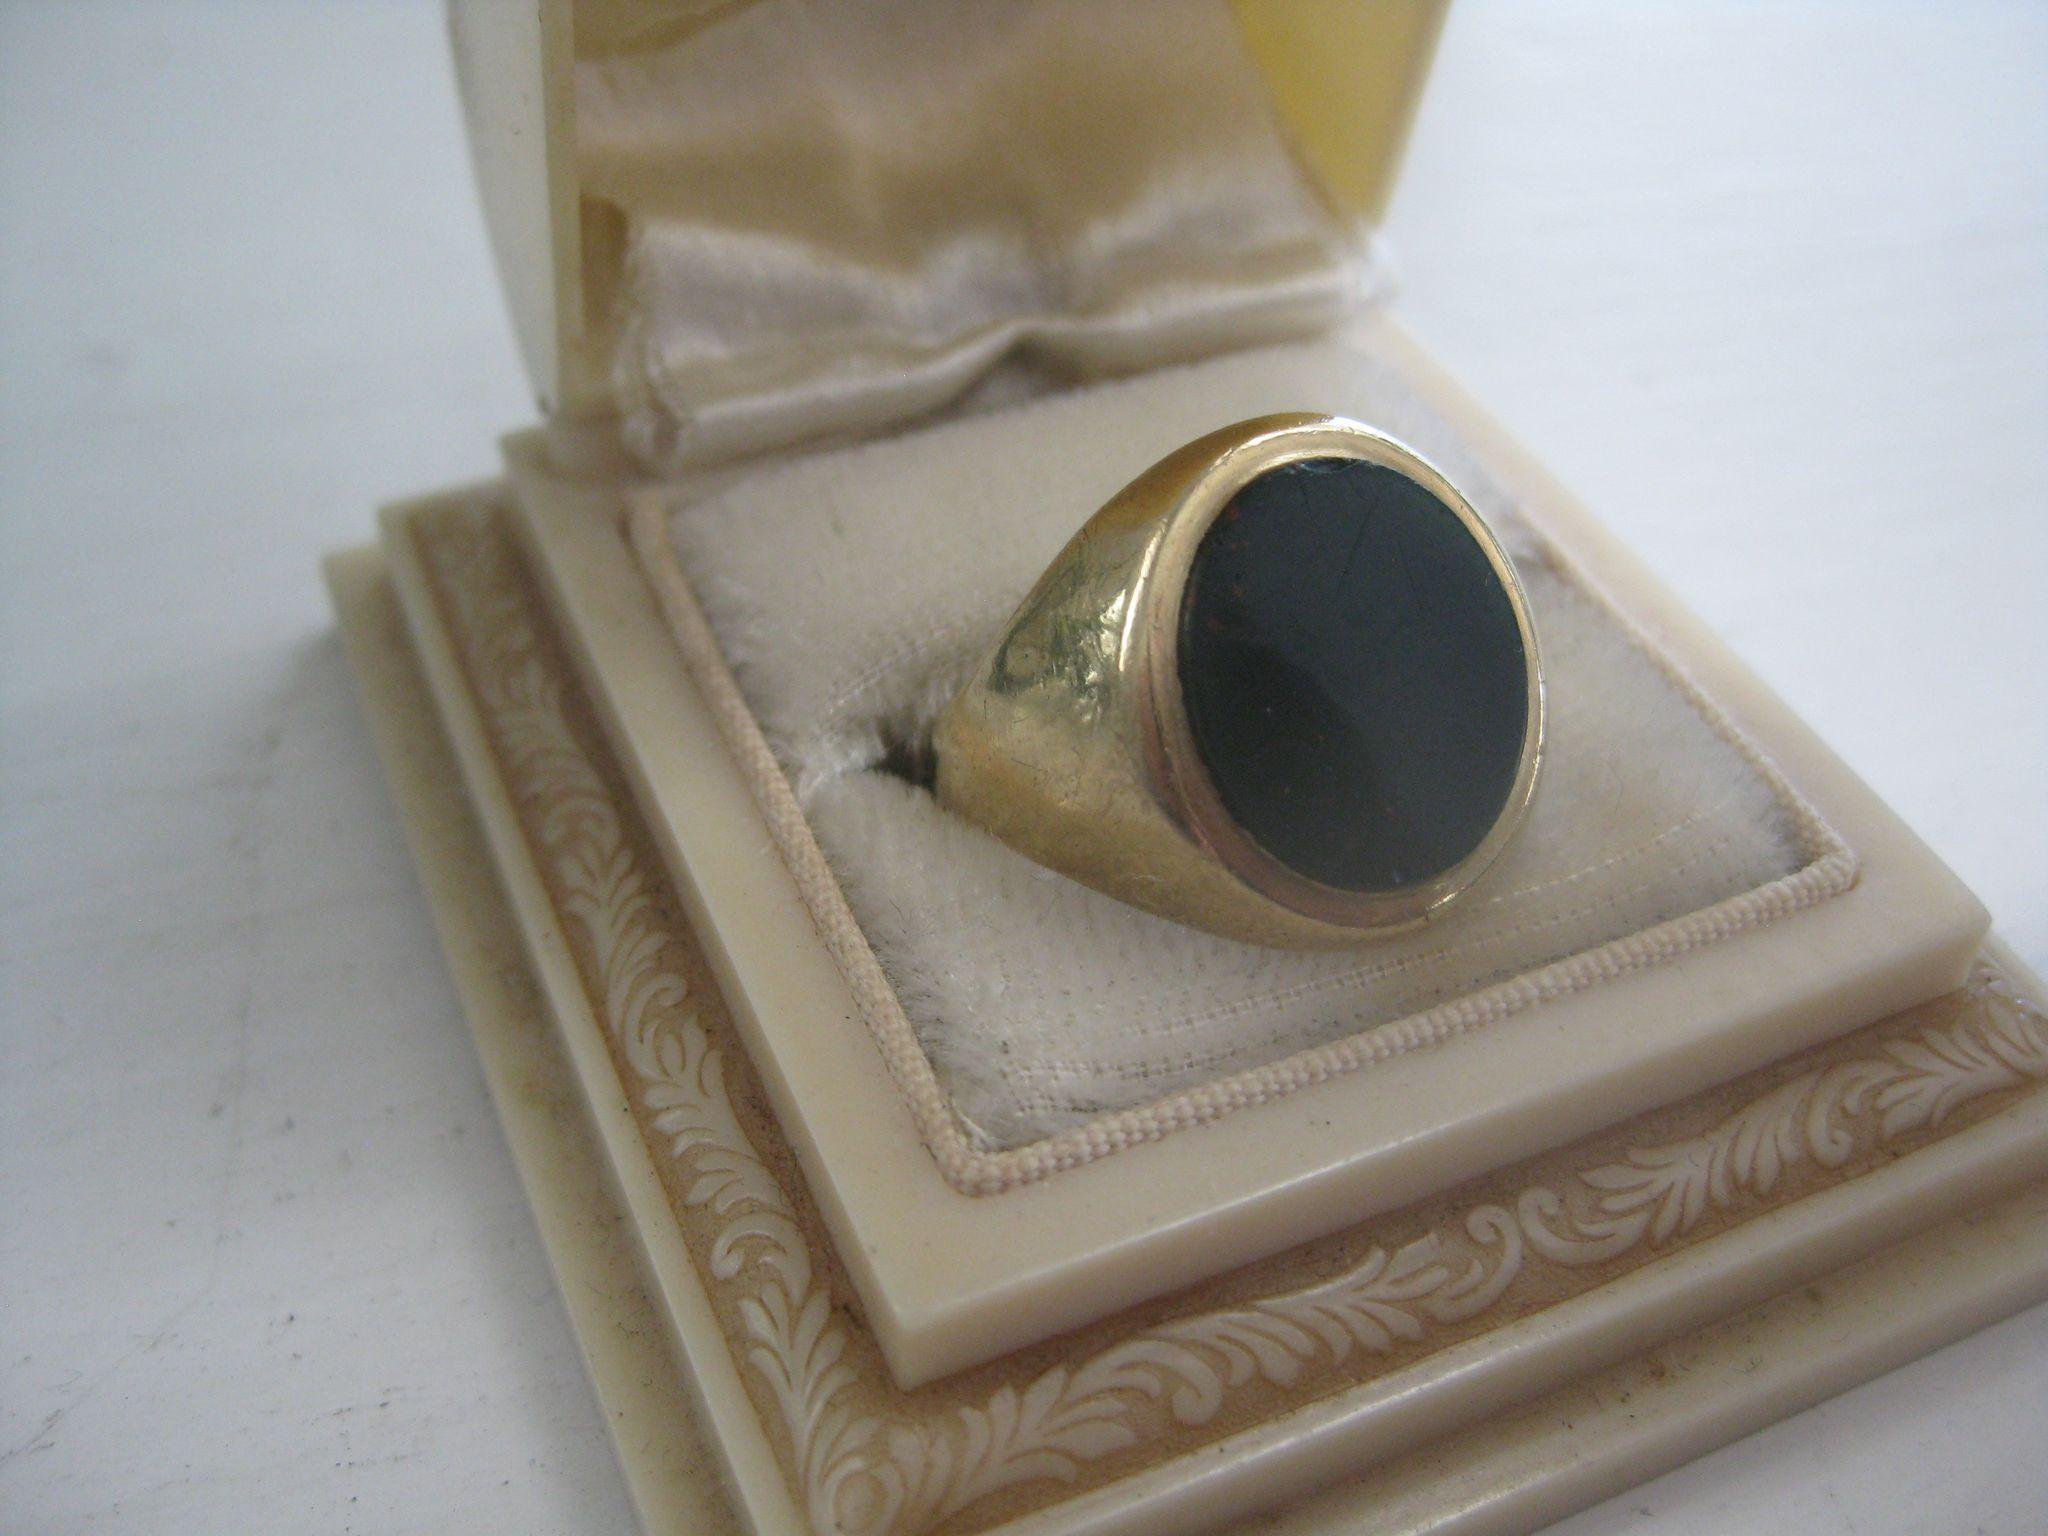 Vintage English 9ct Gold/Onyx Man's Ring, Size 9.75